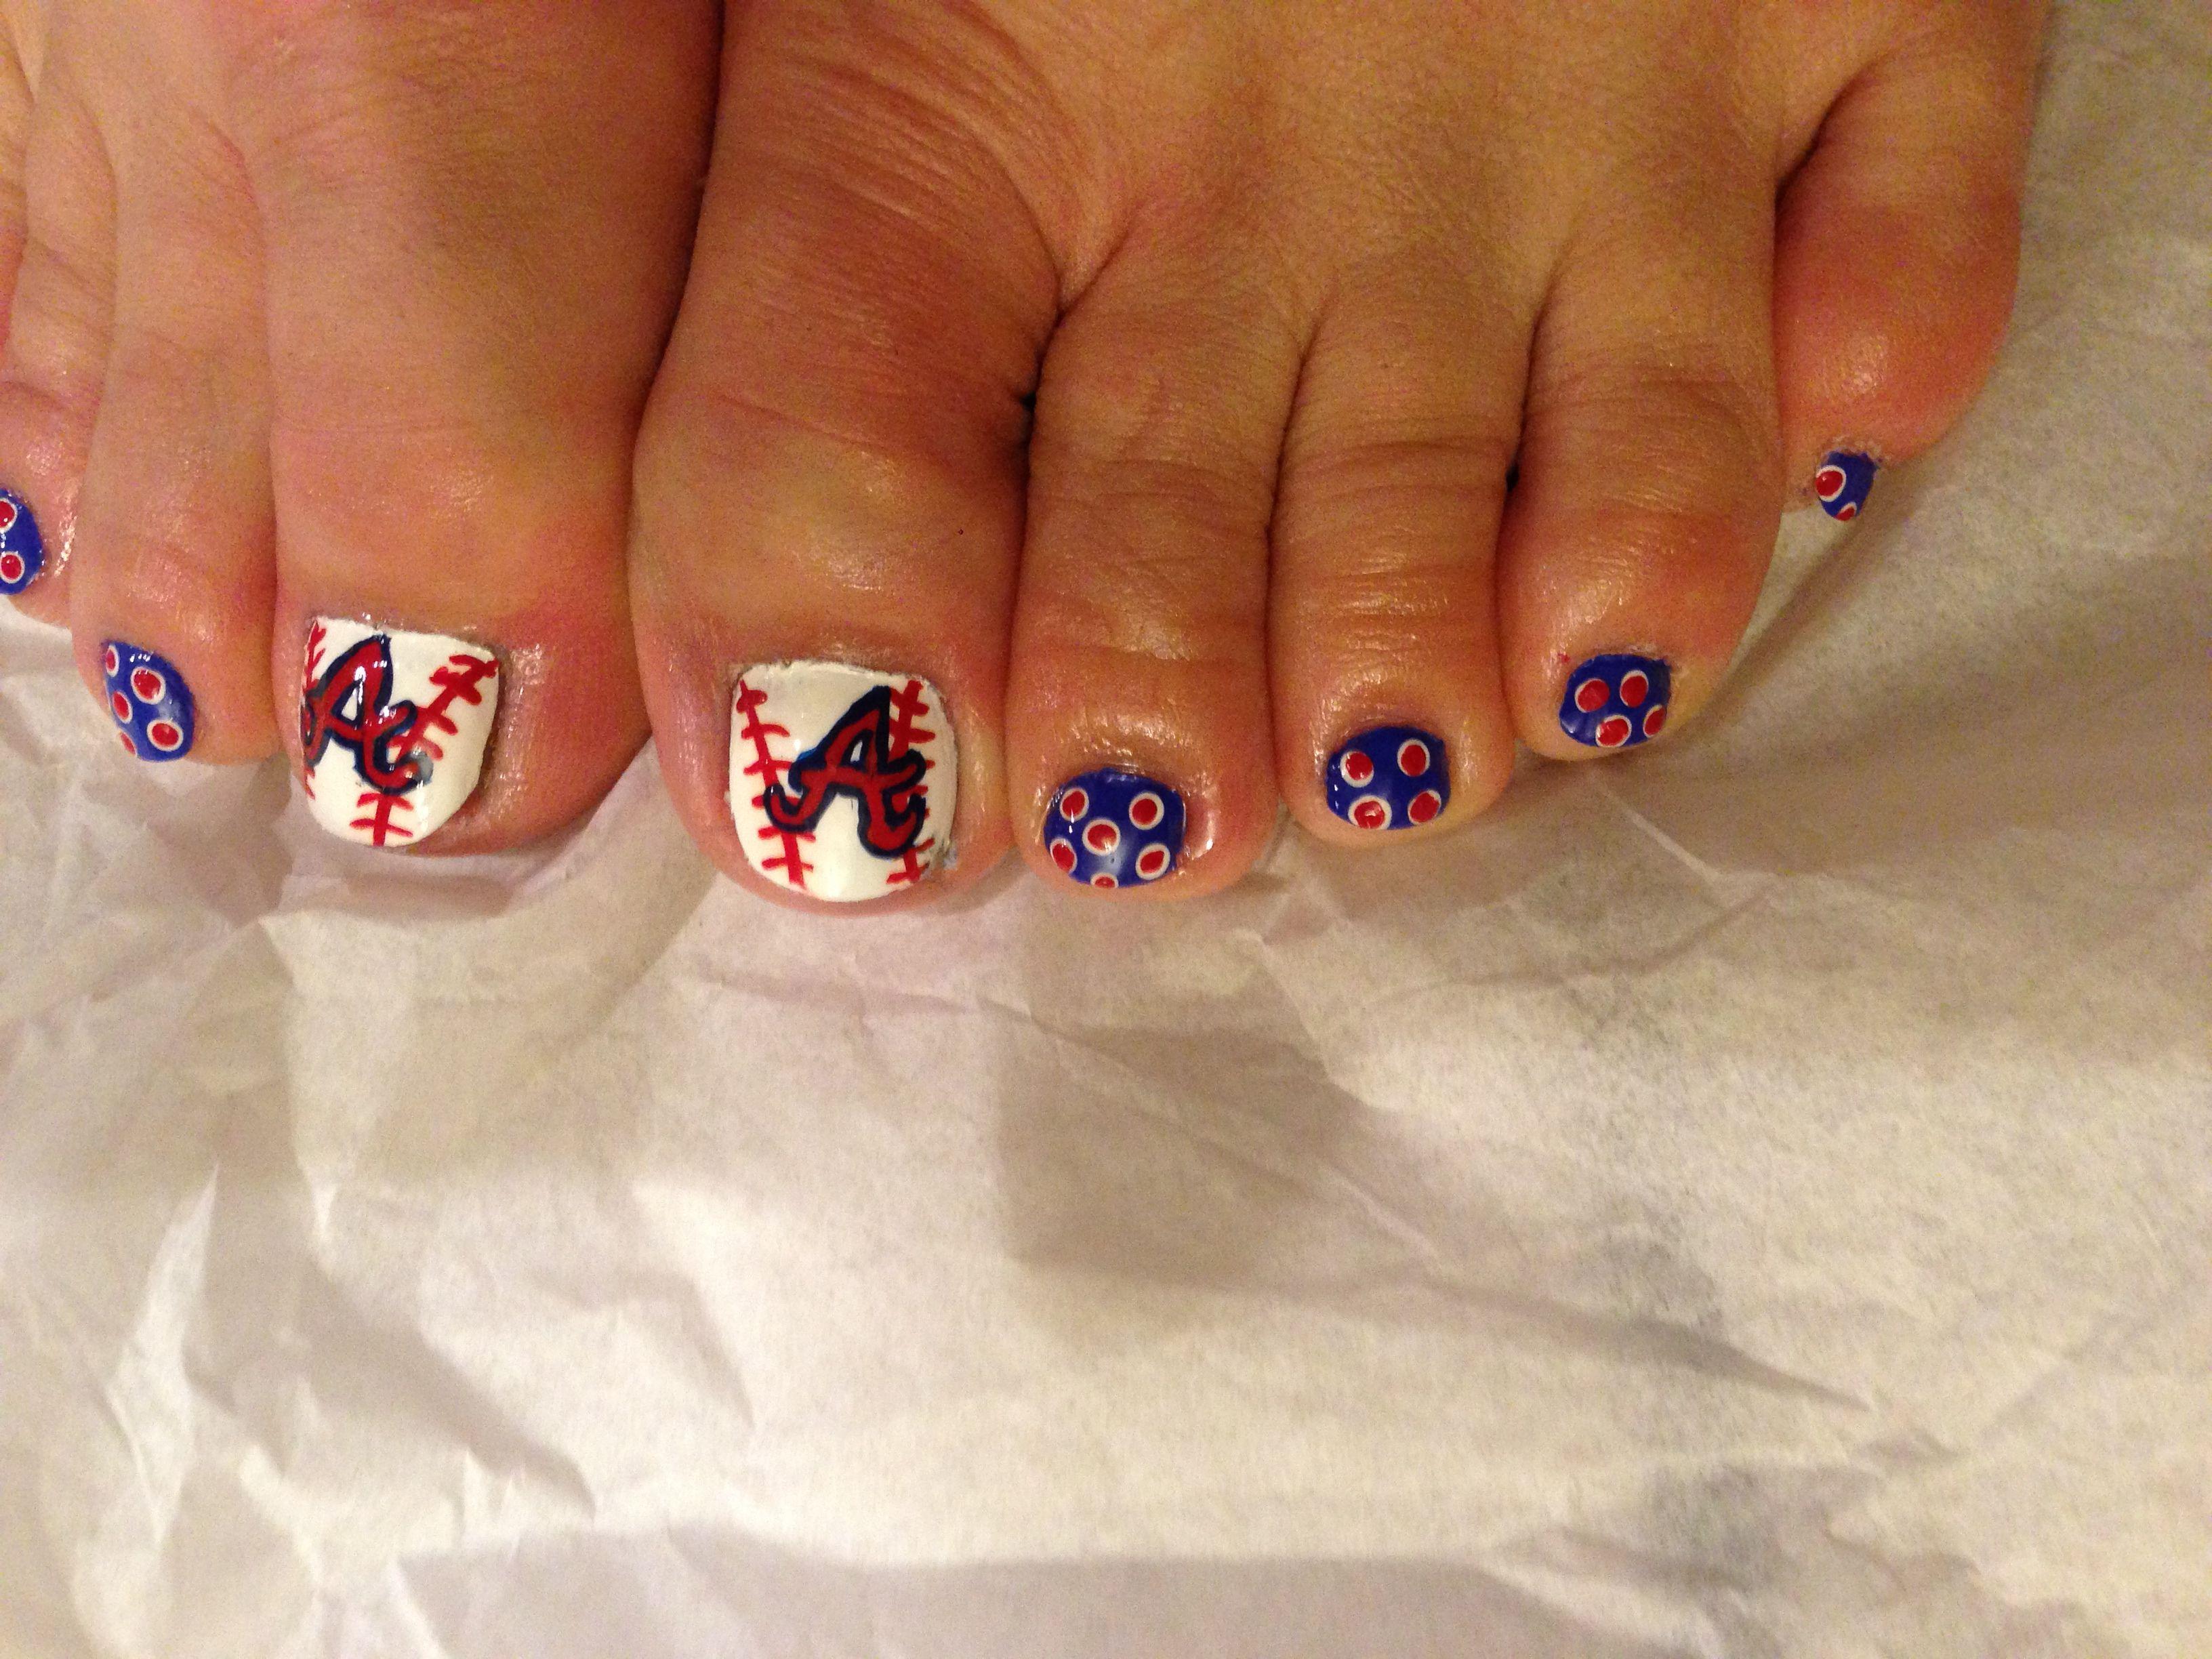 toe nail art. atlanta brave's baseball